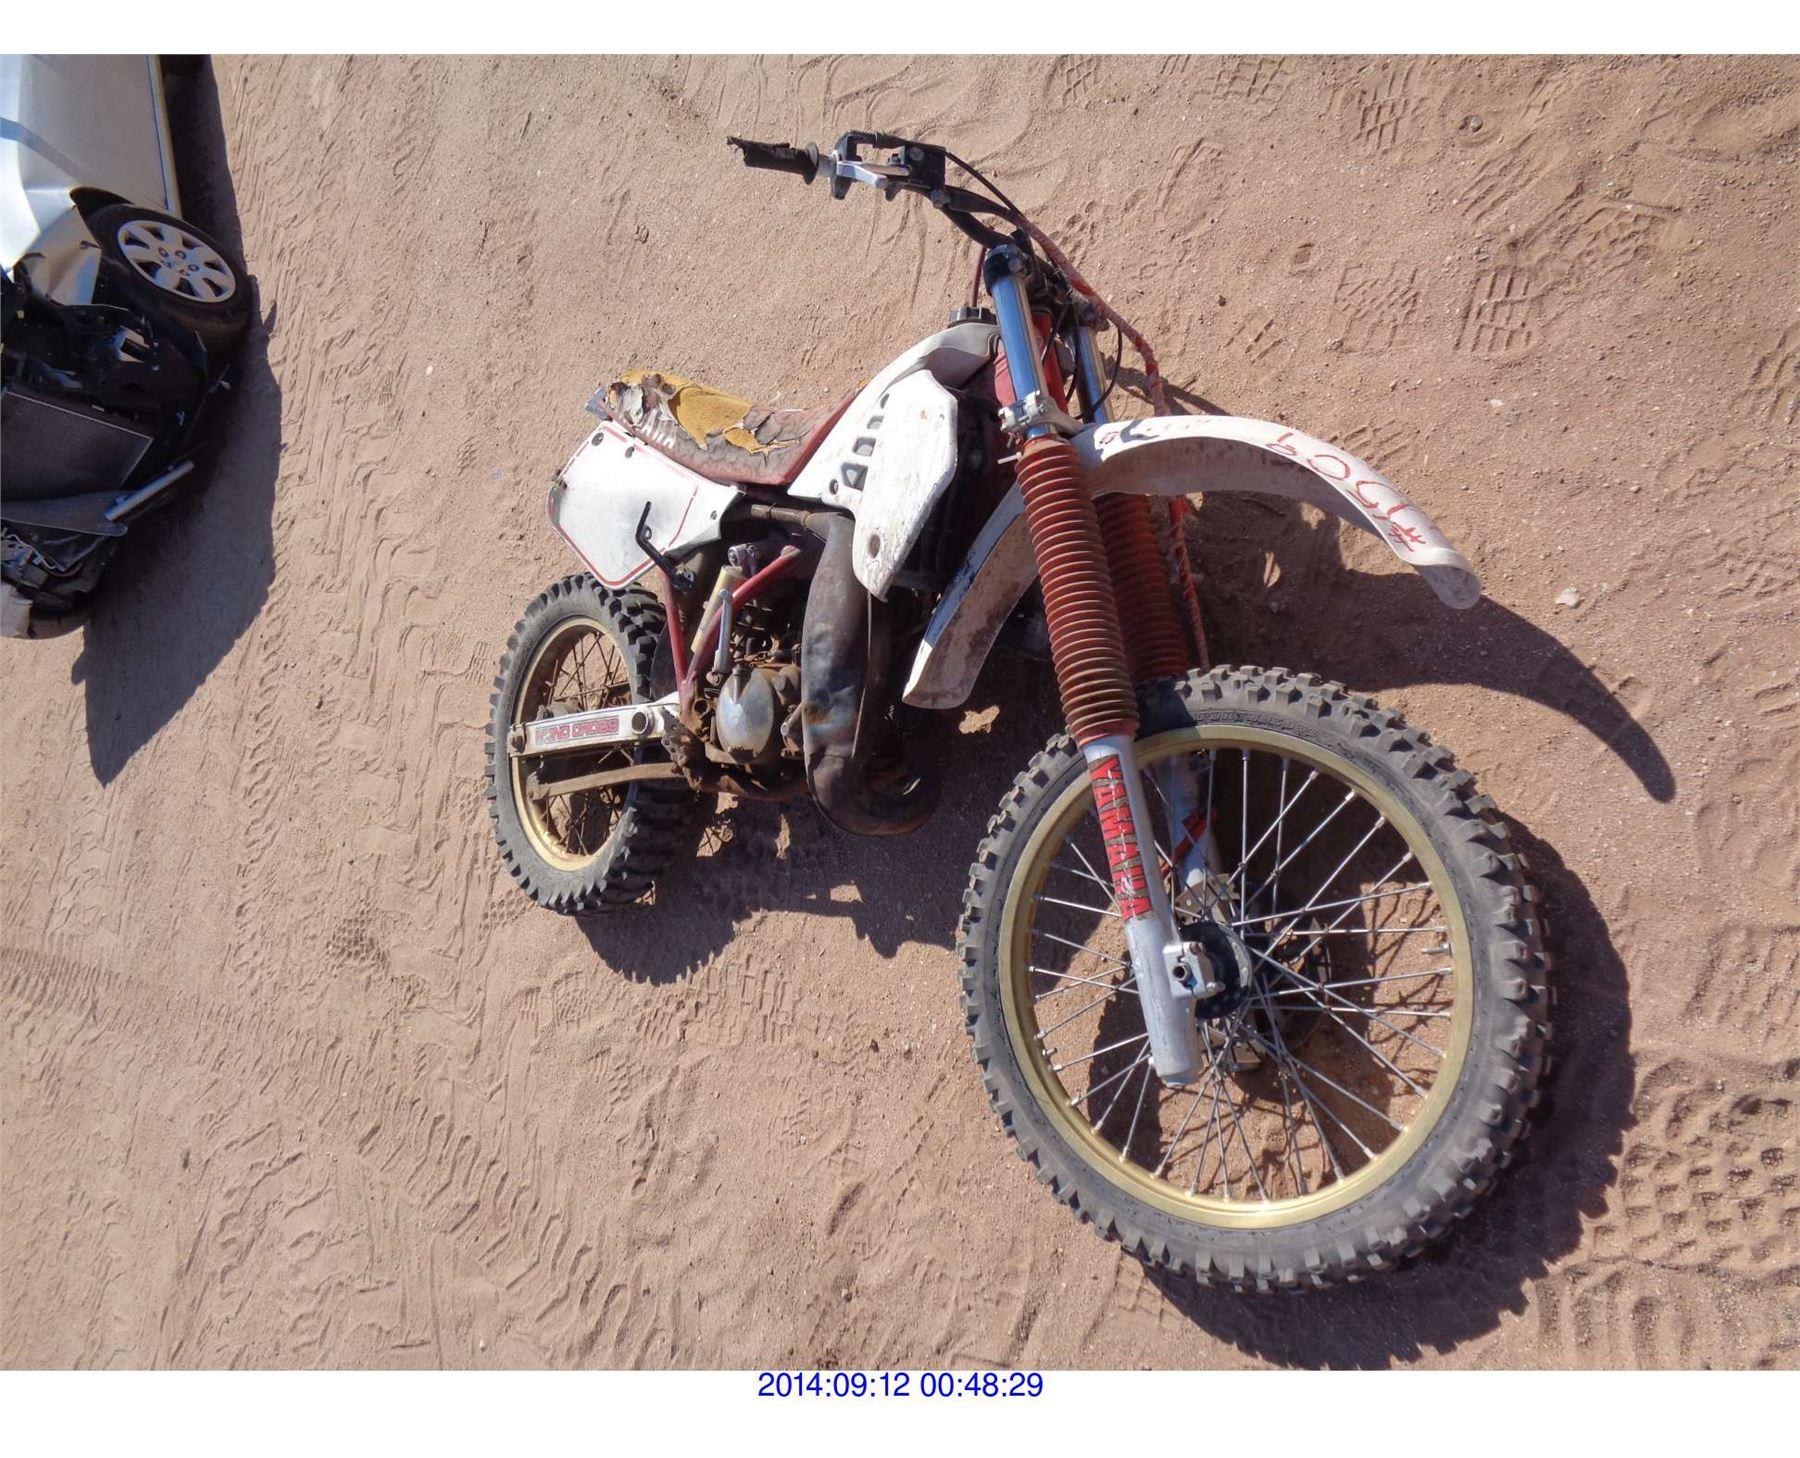 2003 - YAMAHA DIRT BIKE - Rod Robertson Enterprises Inc